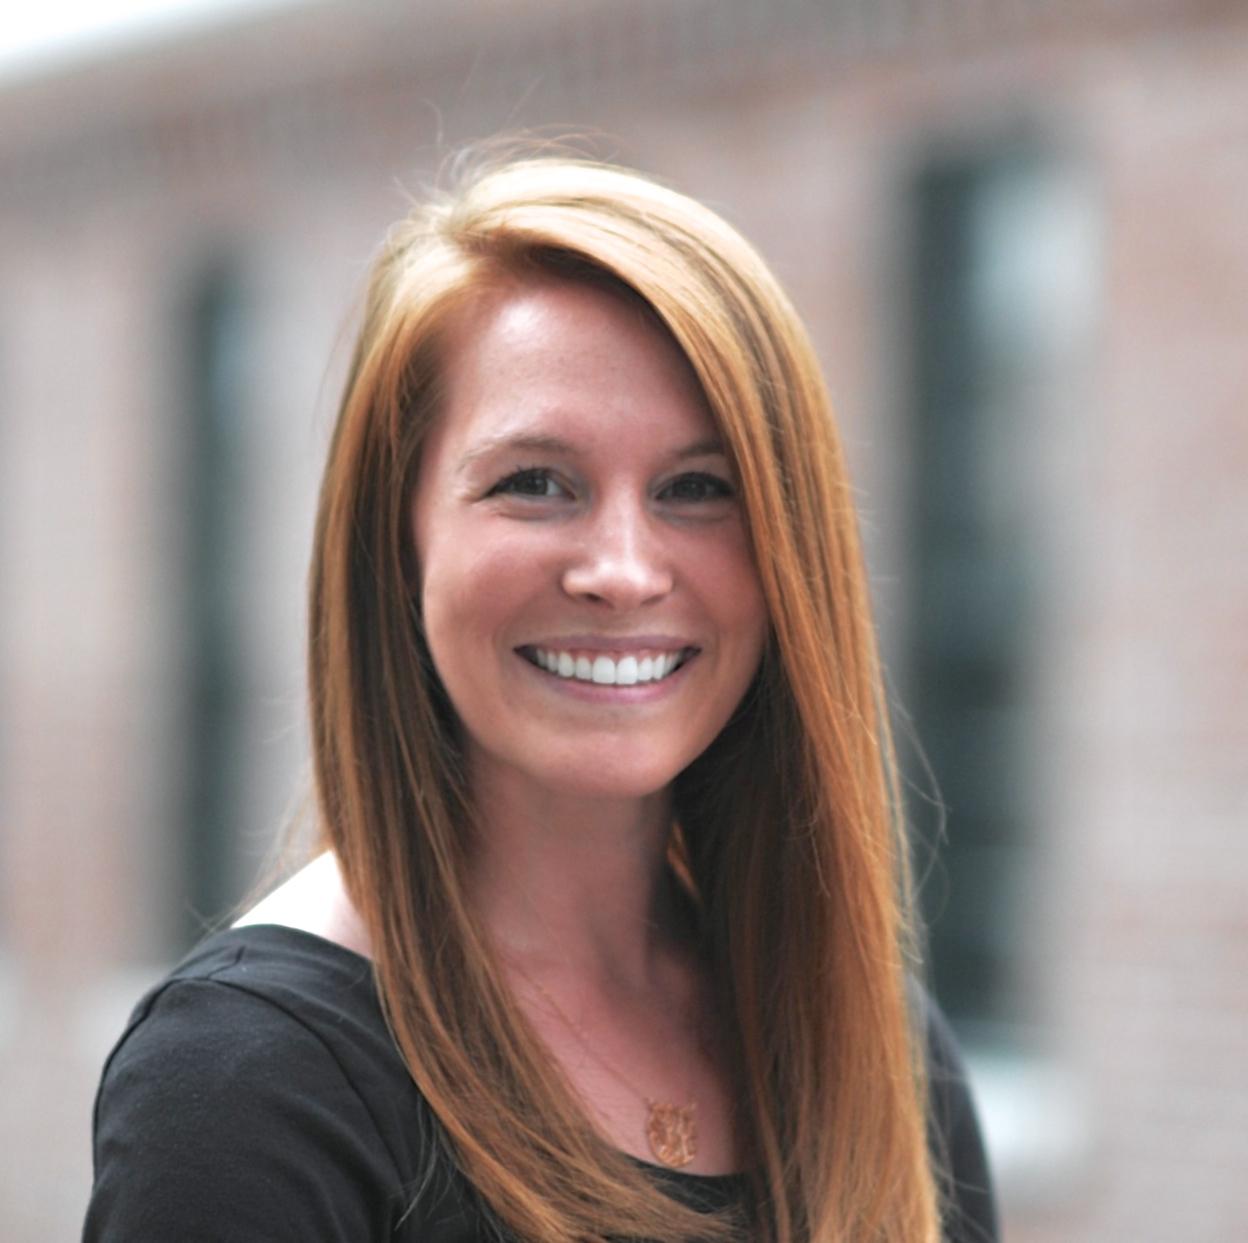 Stephanie Lussier